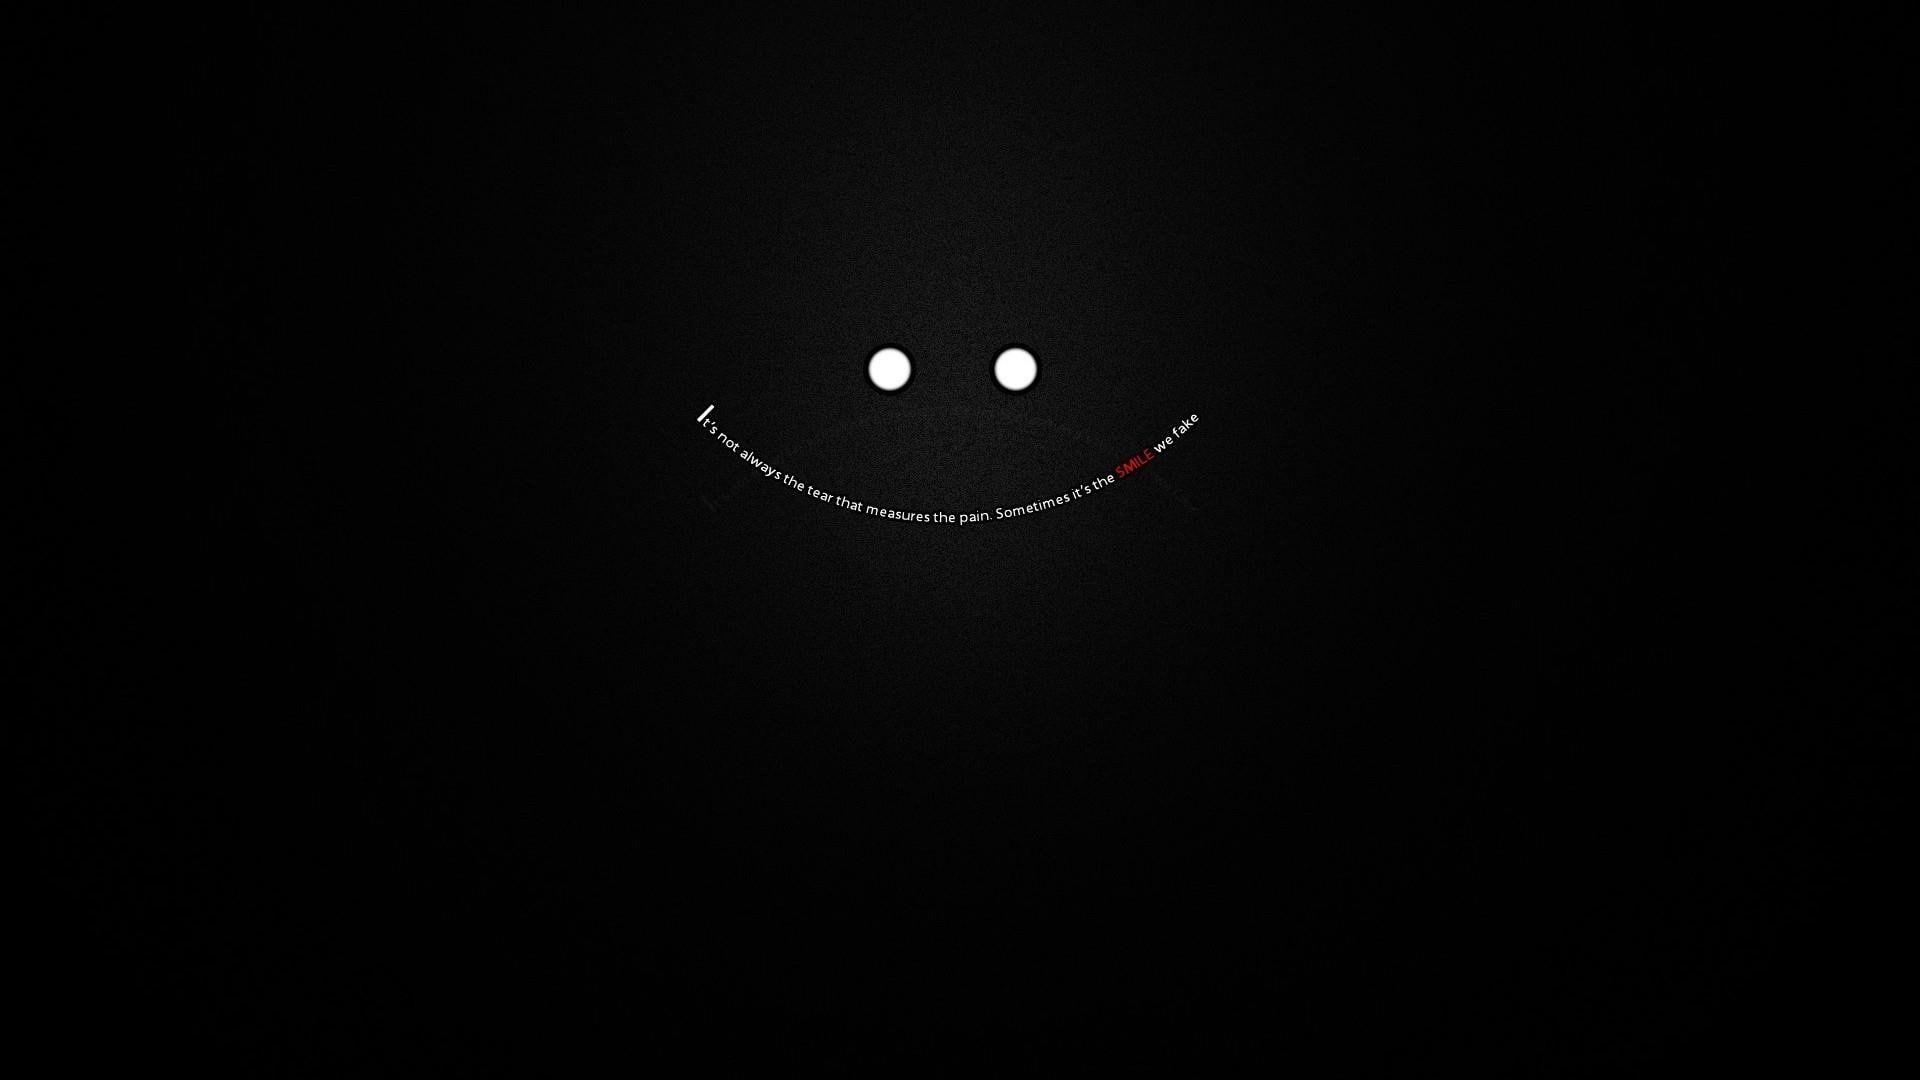 Wallpaper fake, smile, pain, depression quote, inside, black • Wallpaper For You HD Wallpaper For Desktop & Mobile